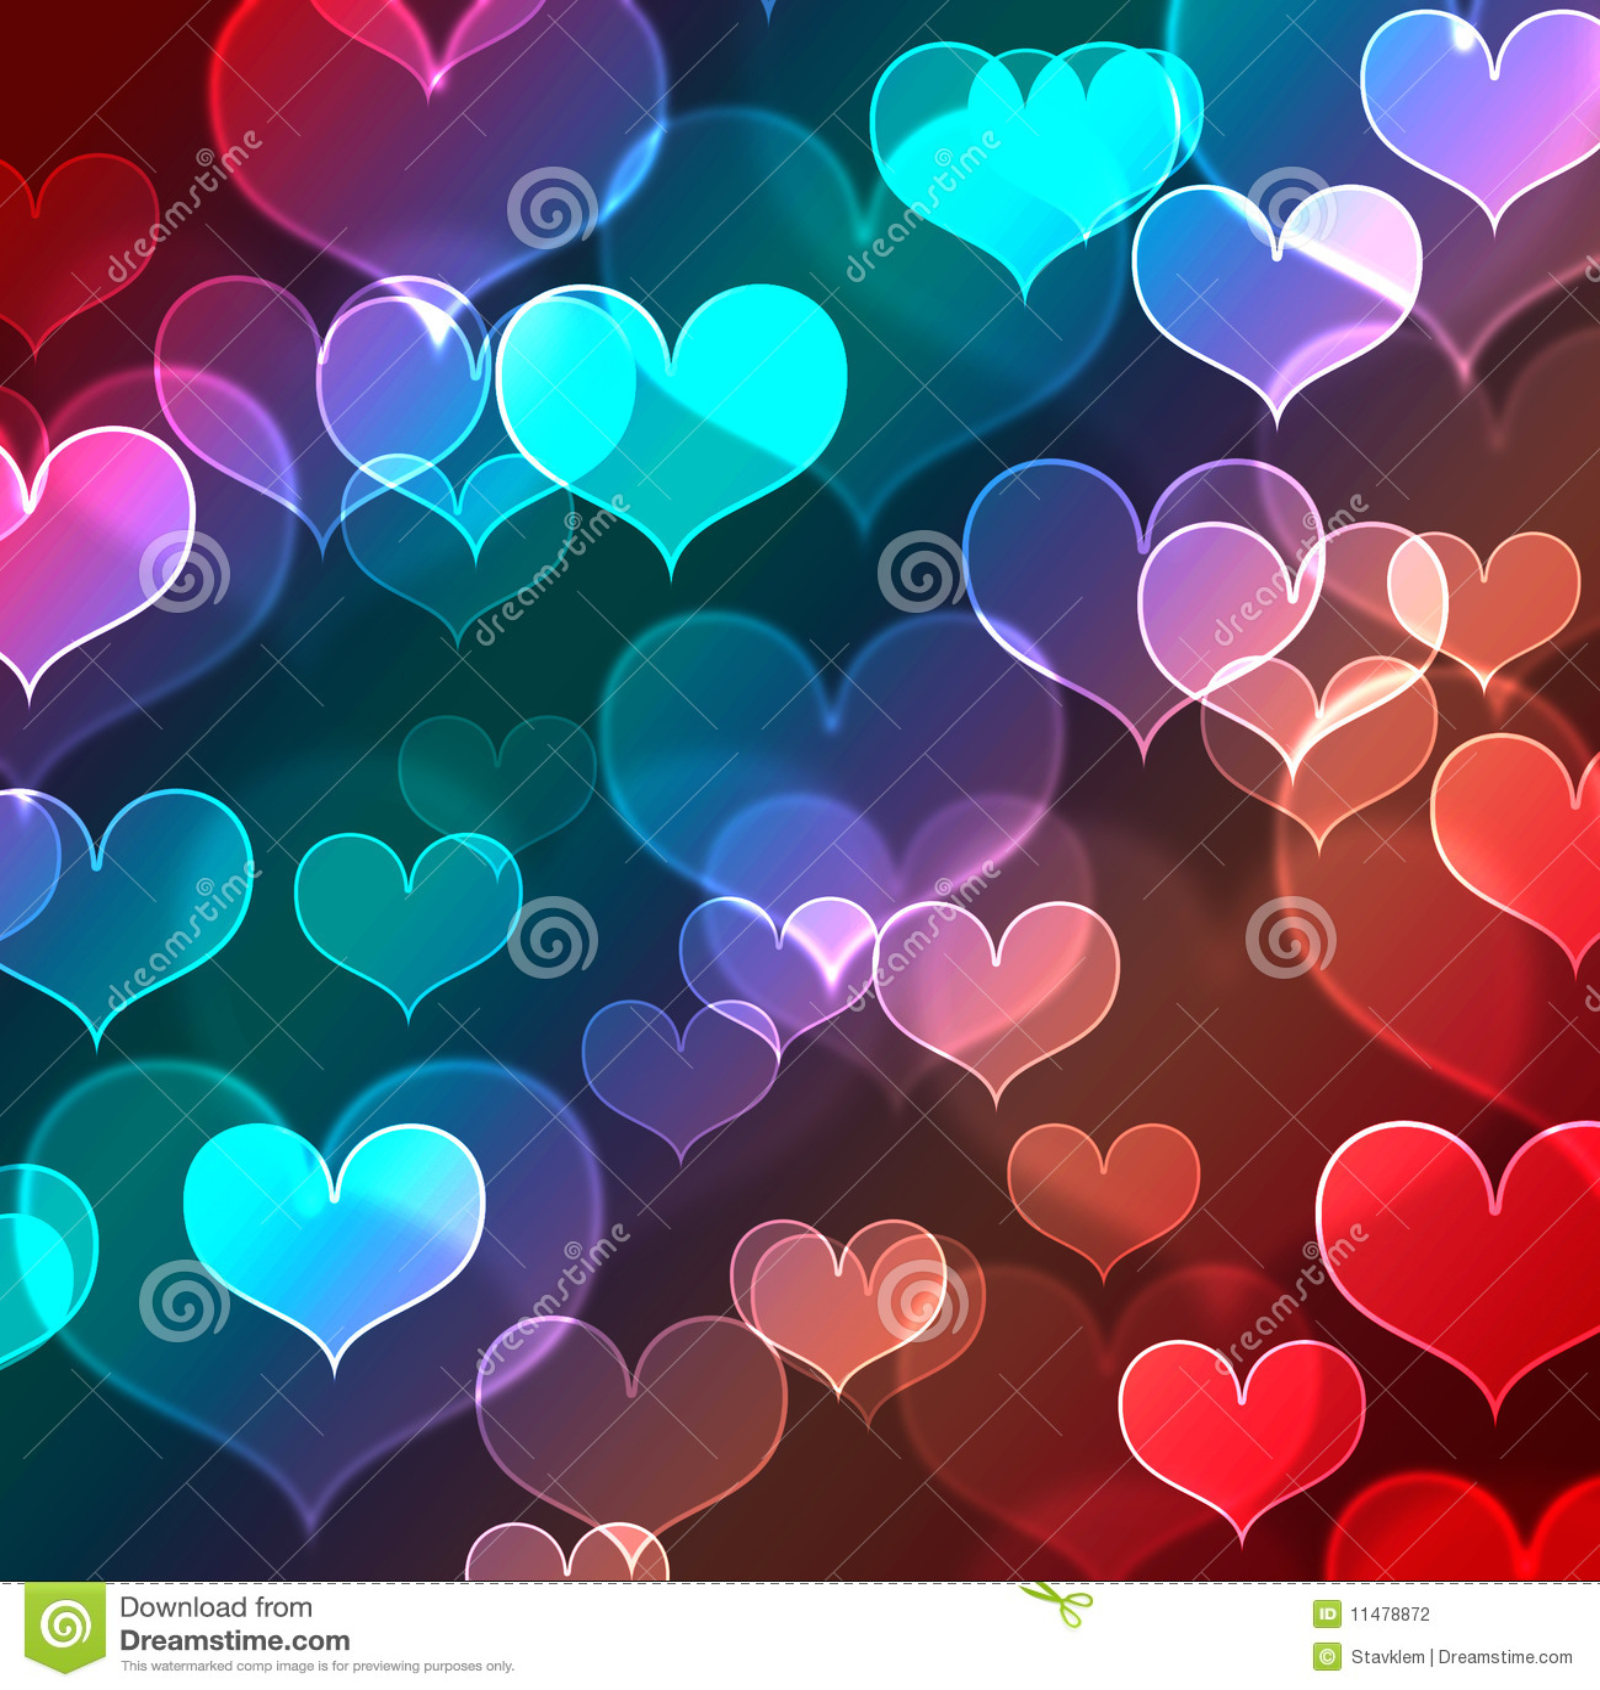 Heart touching Beautiful Love storyA very poor man